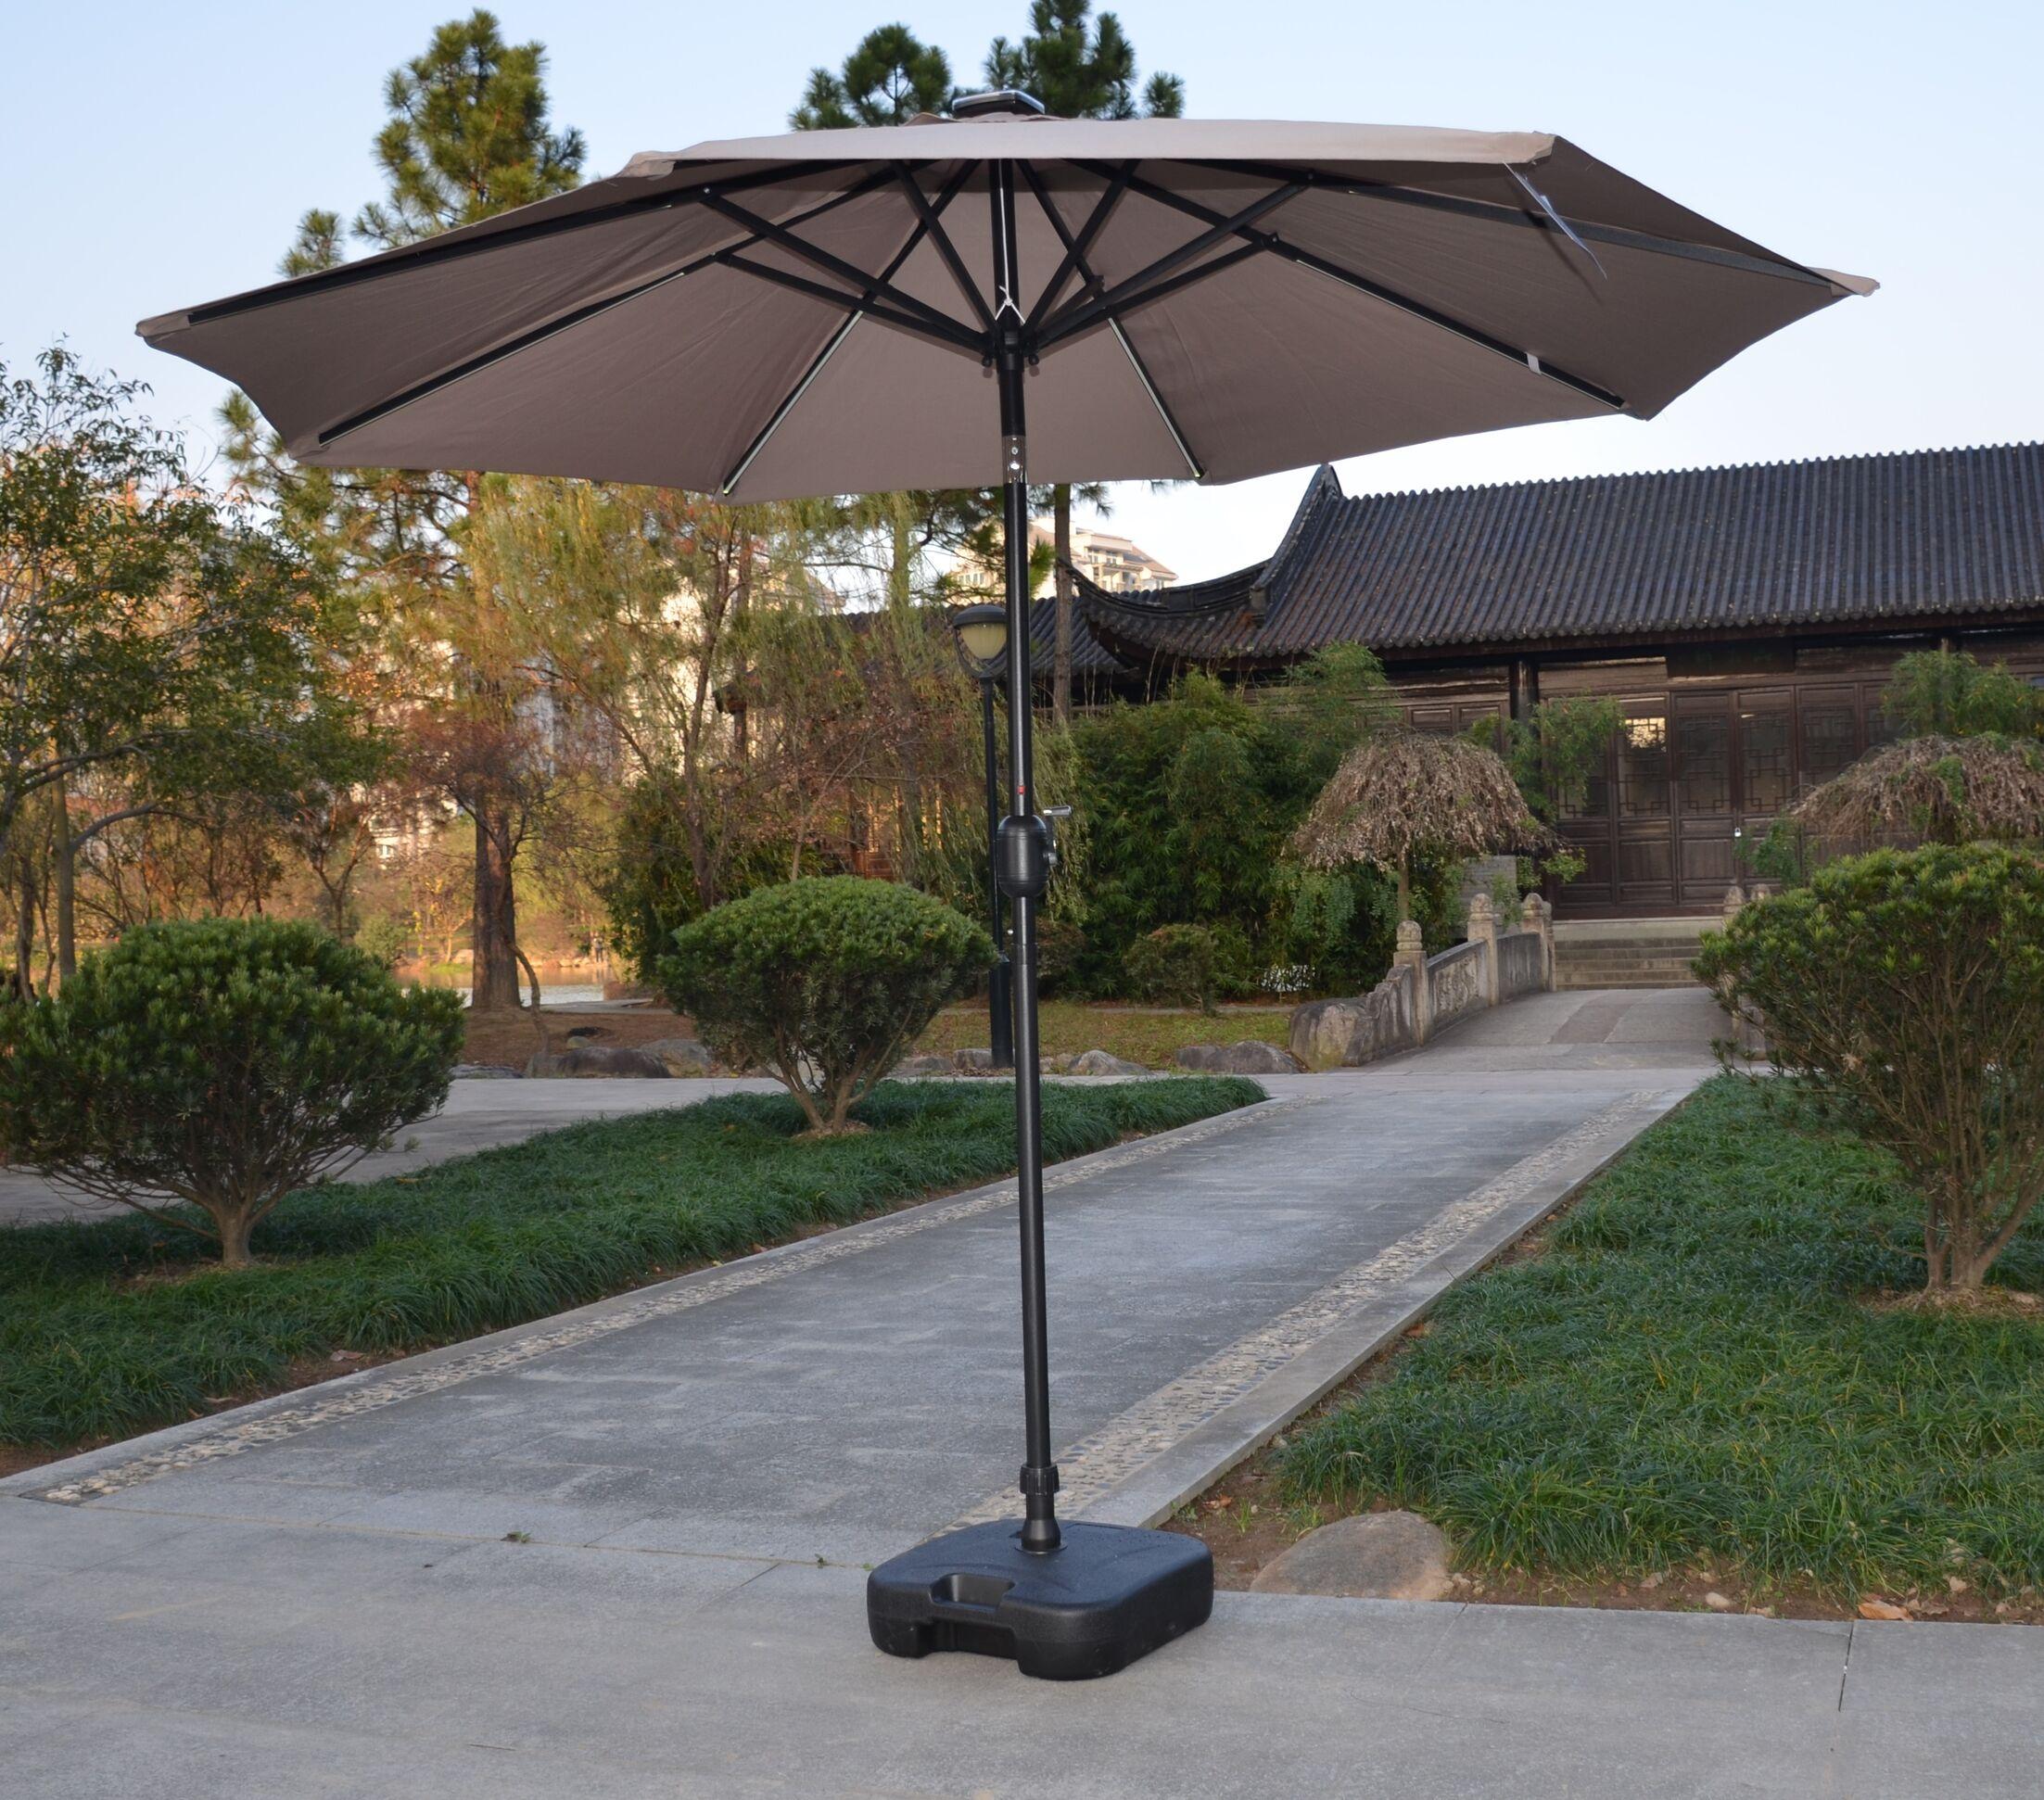 Hurst 10' Market Umbrella Fabric Color: Taupe